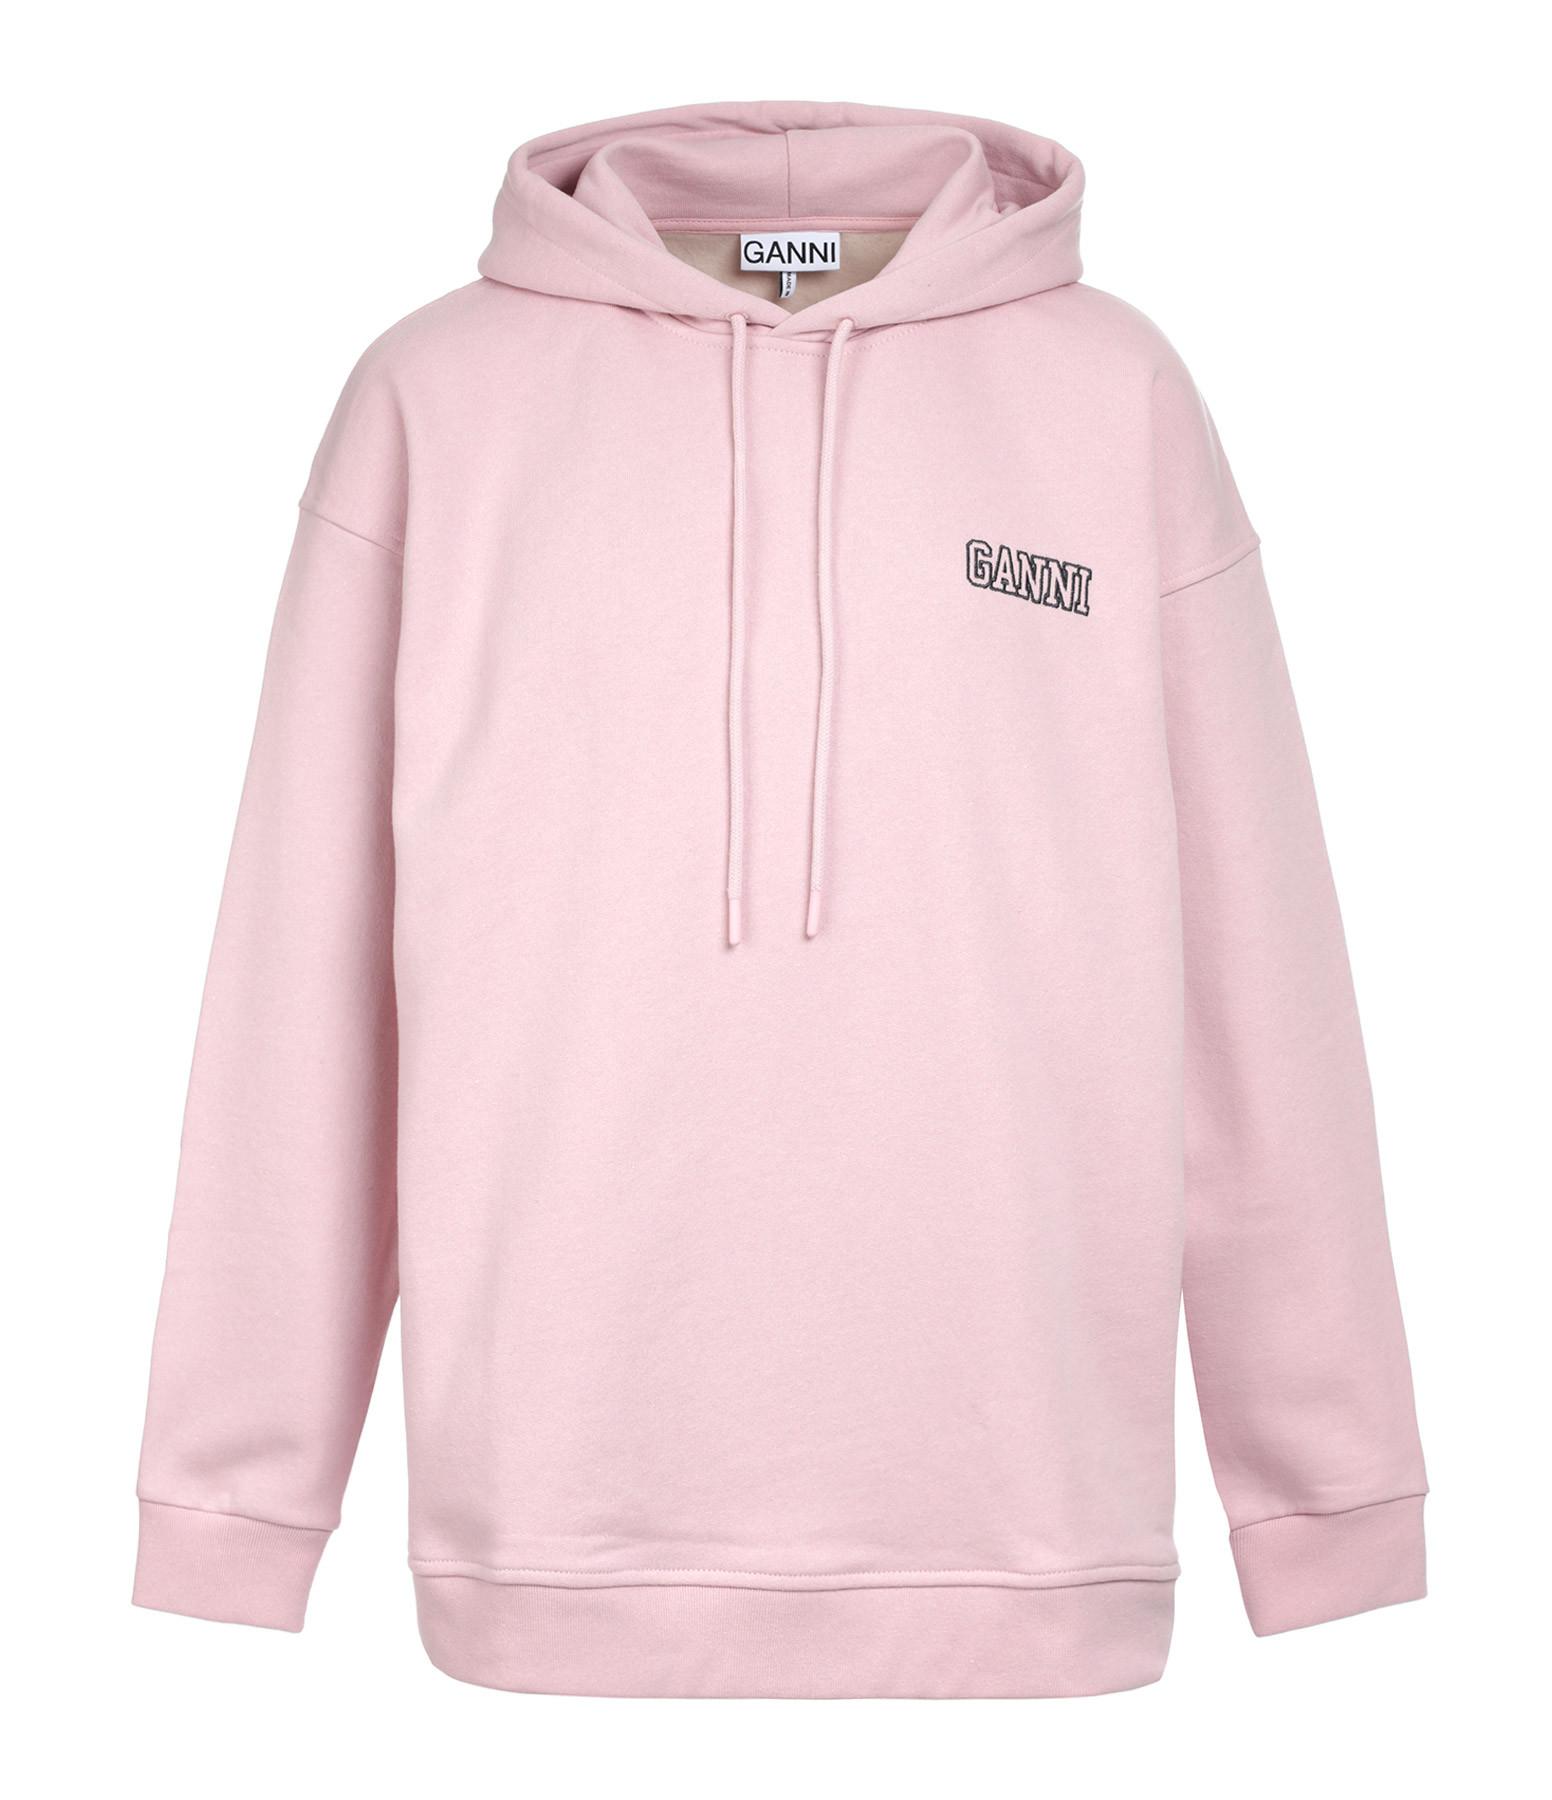 GANNI - Sweatshirt Software Isoli Rose